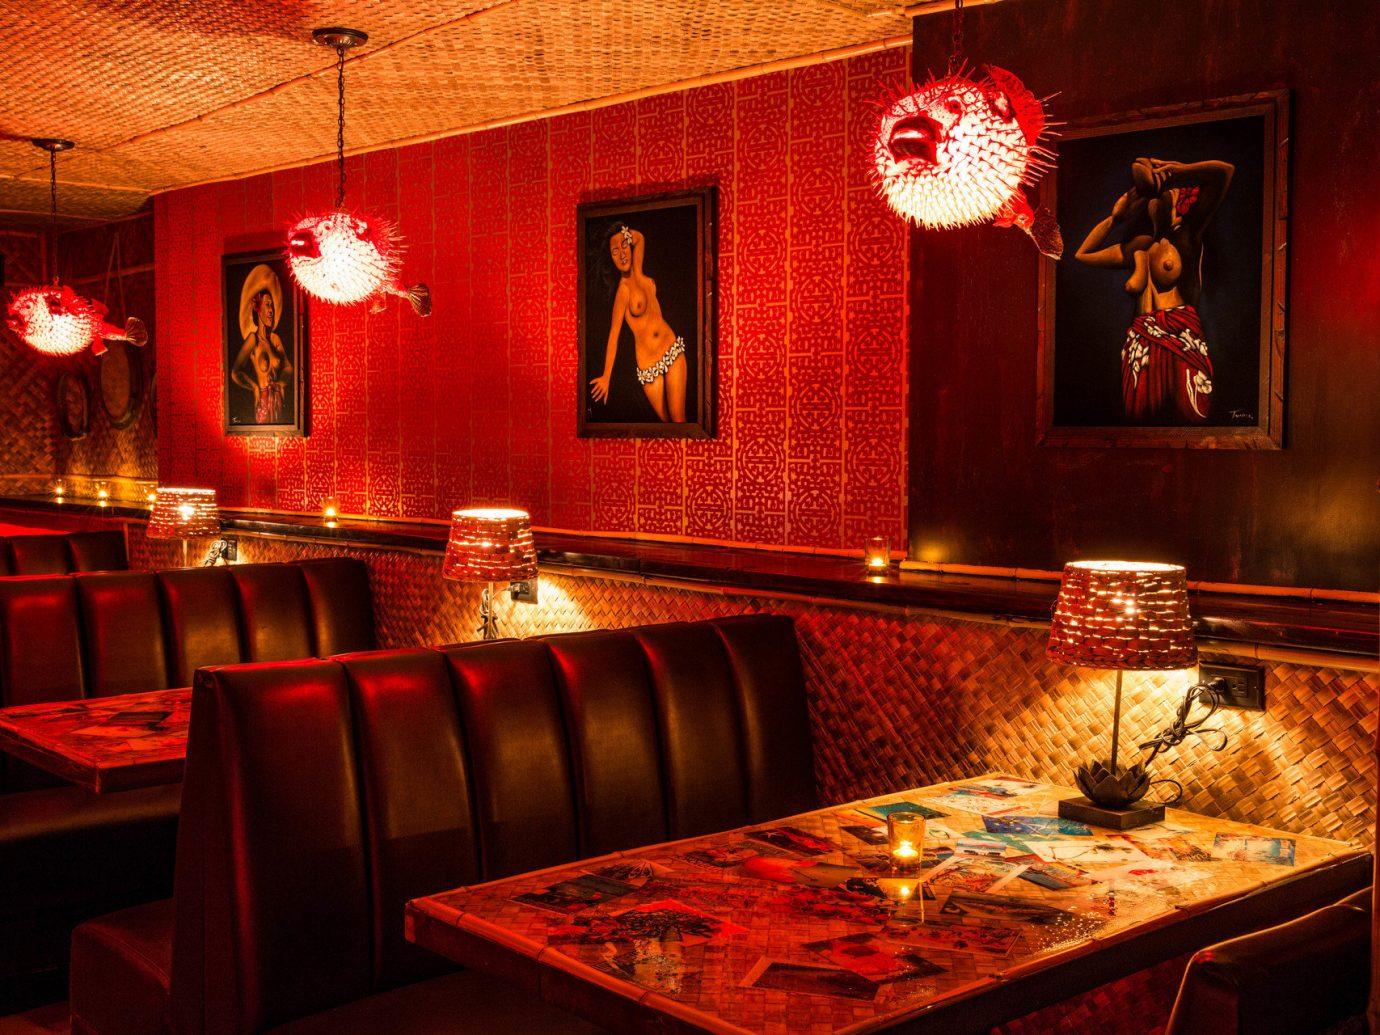 Jetsetter Guides Road Trips Trip Ideas Weekend Getaways indoor room red restaurant interior design Bar recreation room decorated